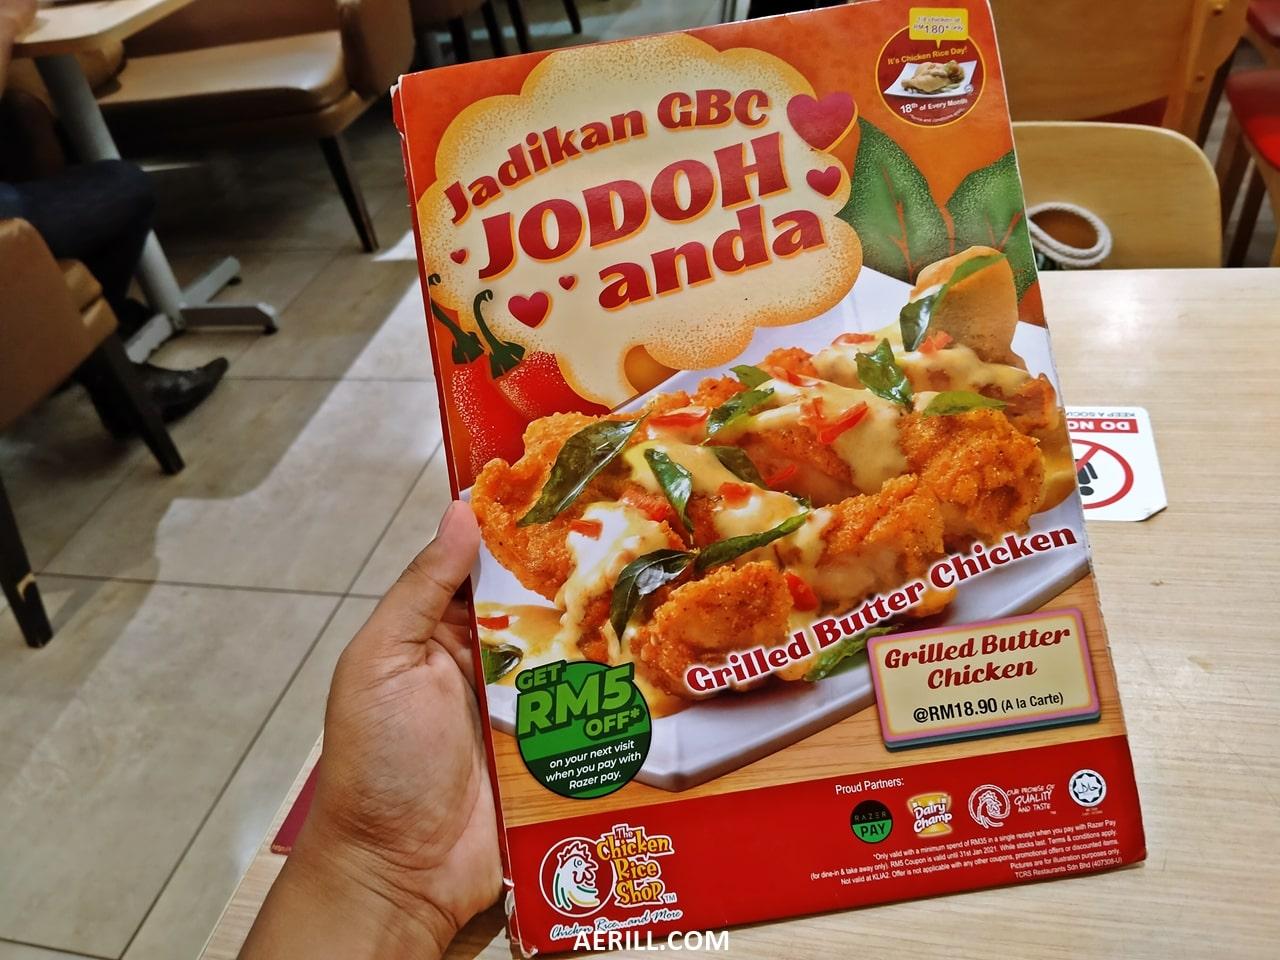 The Chicken Rice Shop Bawa Kembali Hidangan 'Grilled Butter Chicken'